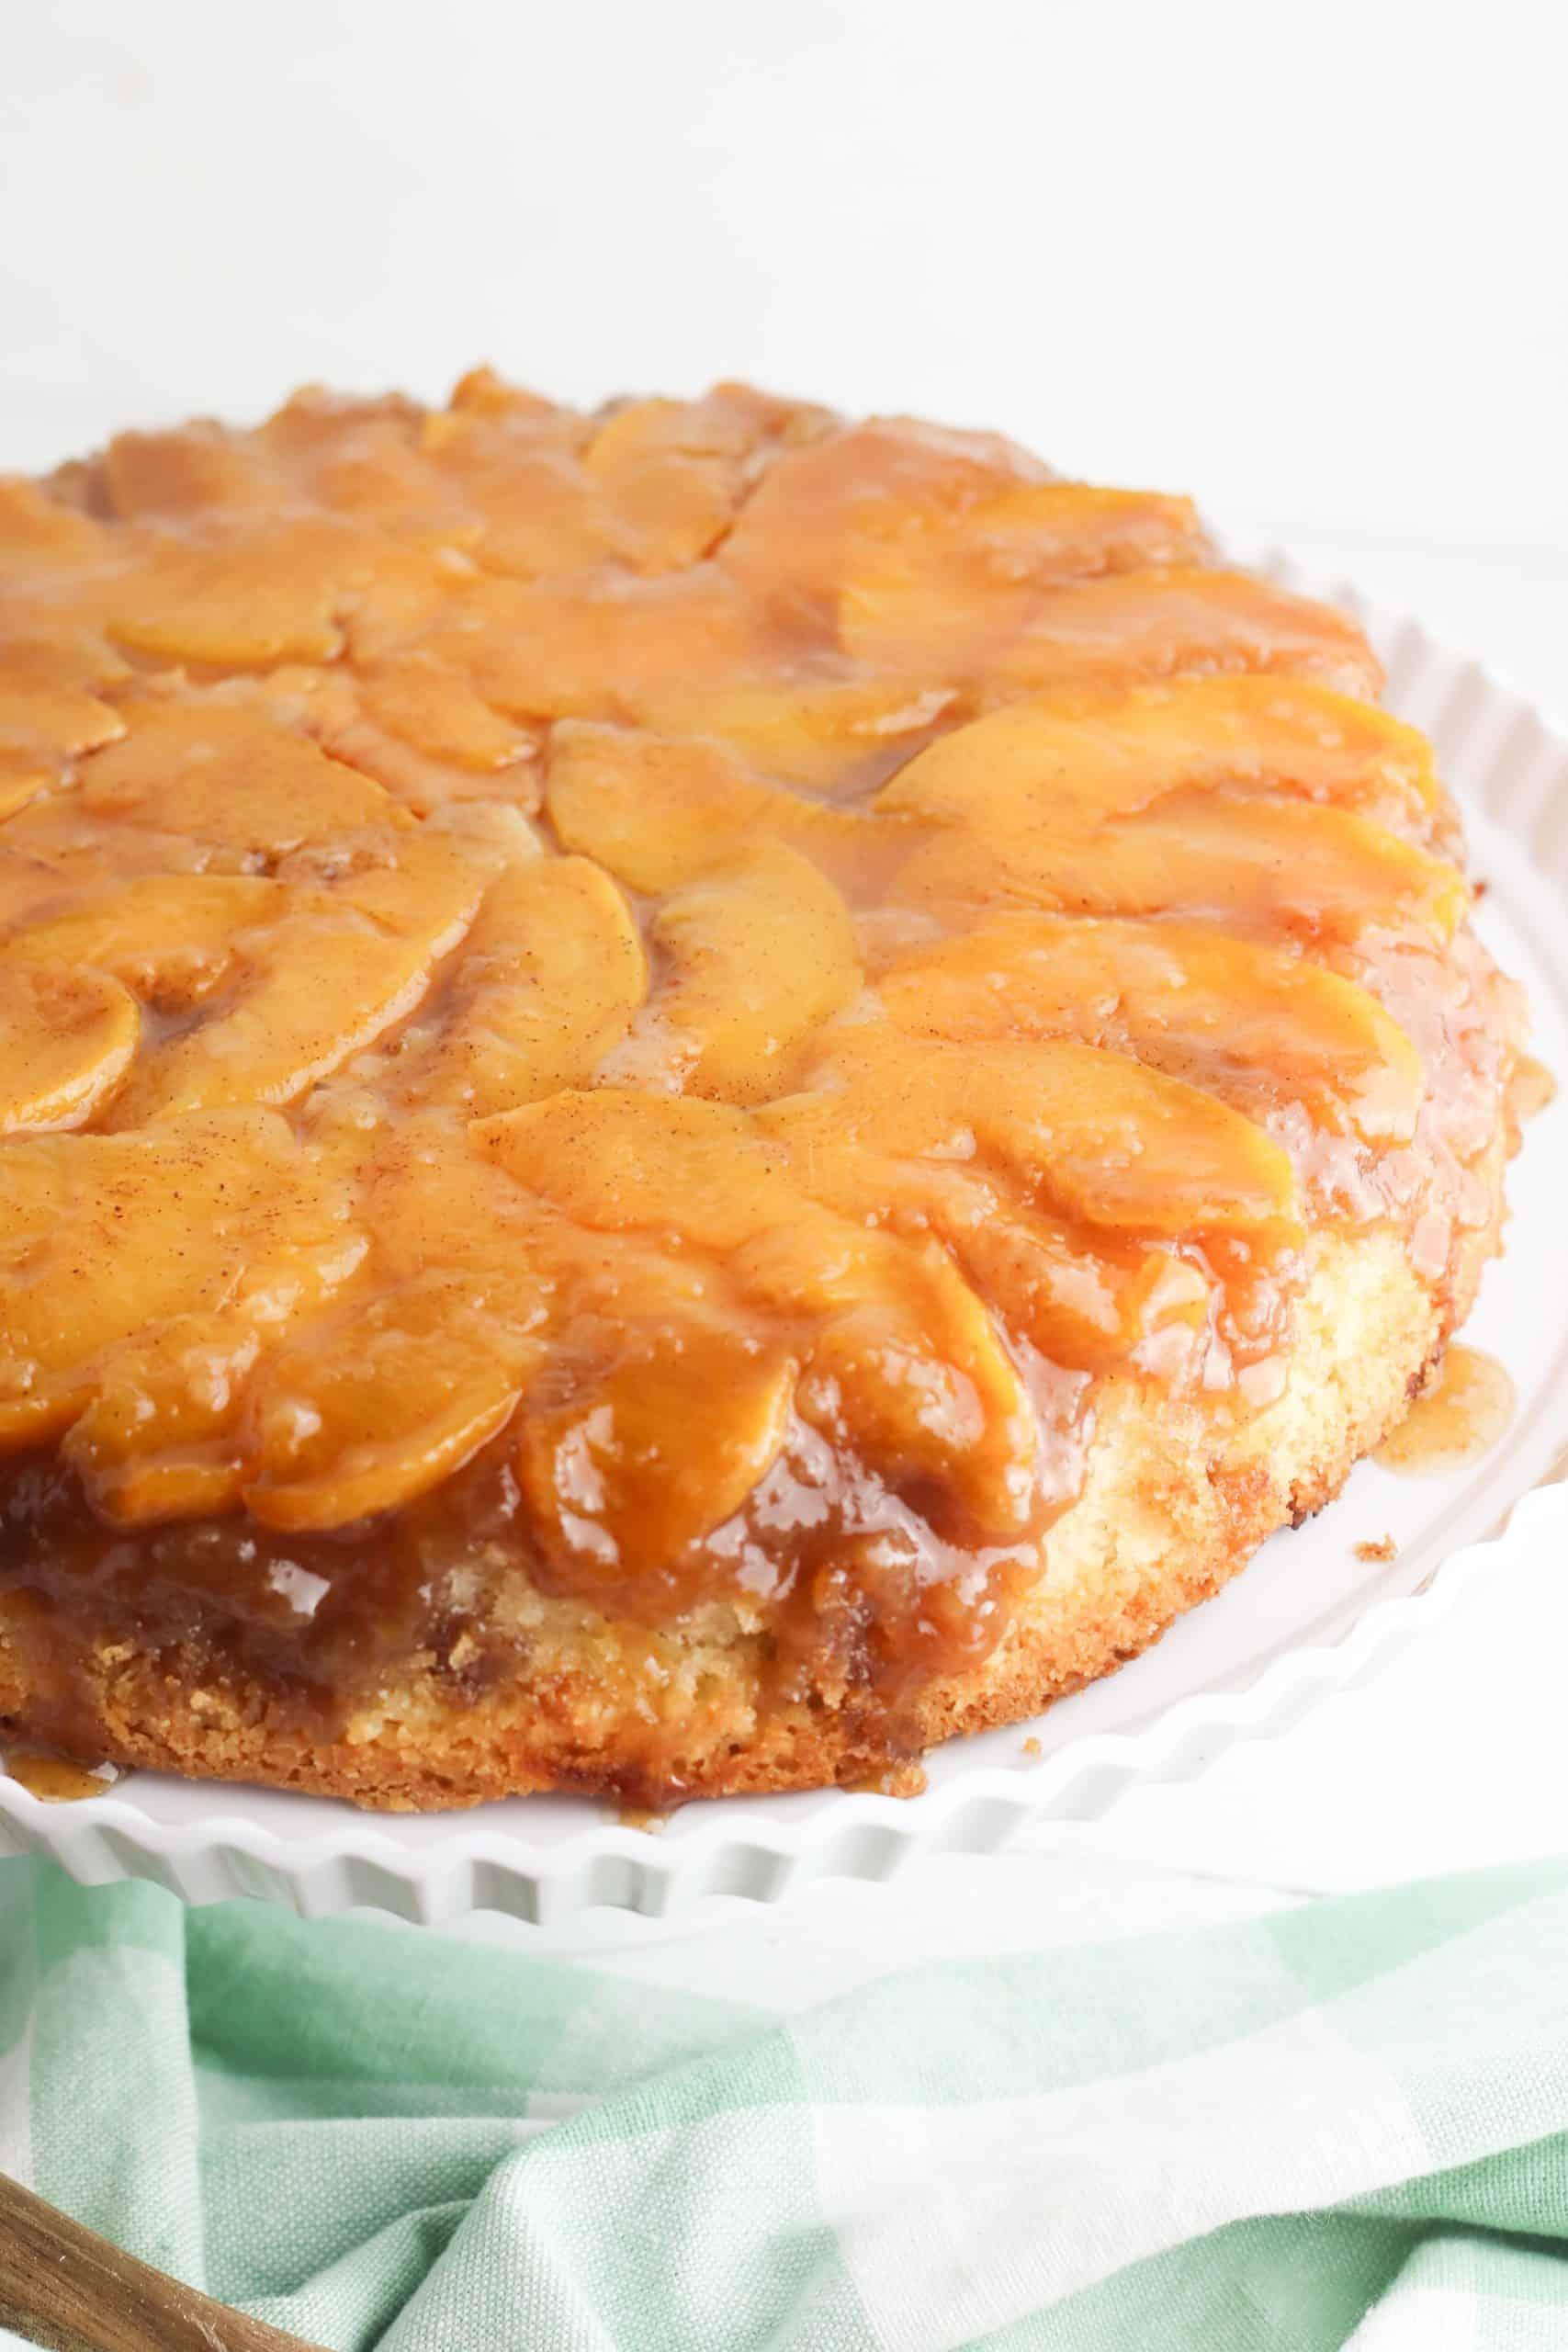 Whole Peach Upside Down Cake